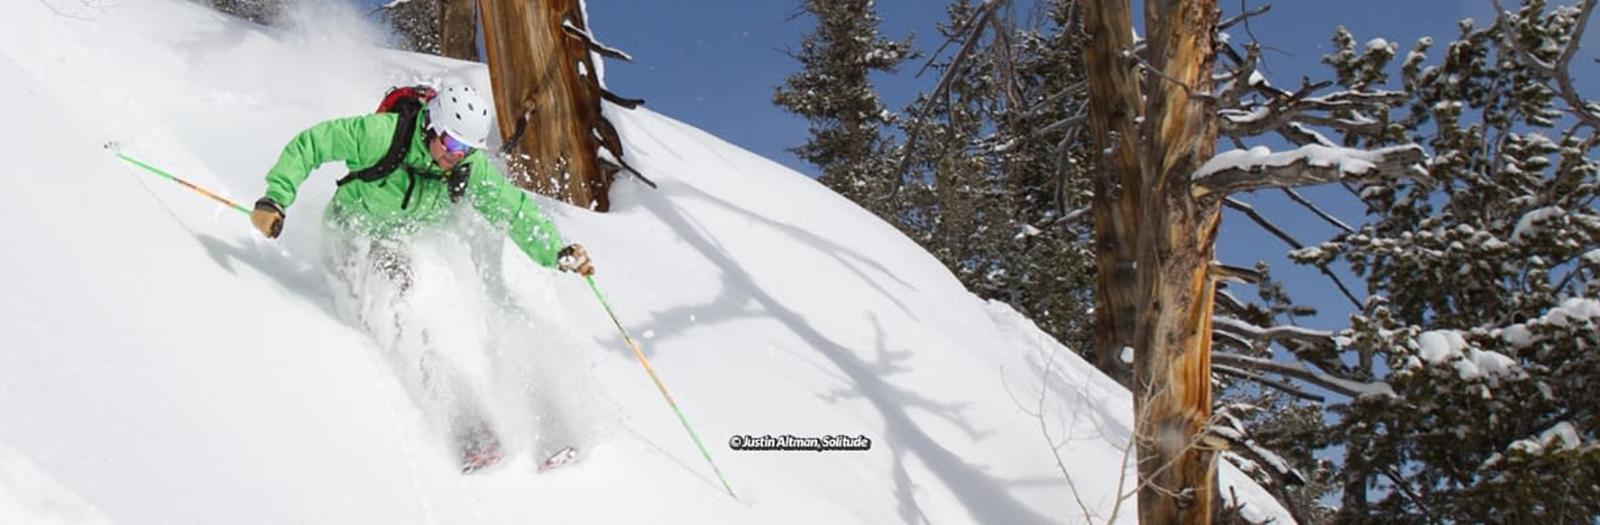 Solitude Ski Resort, ski solitude, solitude packages, snowboard packages